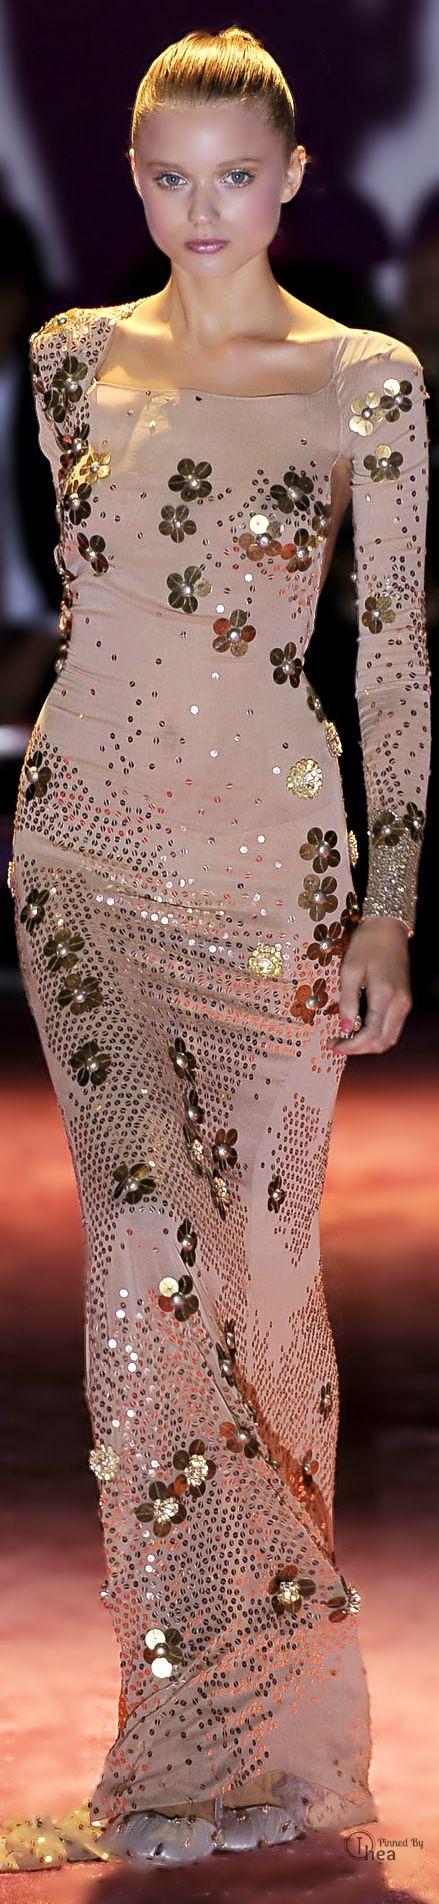 Zac Posen ~ Elegant Form Fitting Gown, Blush w Gold embellishments